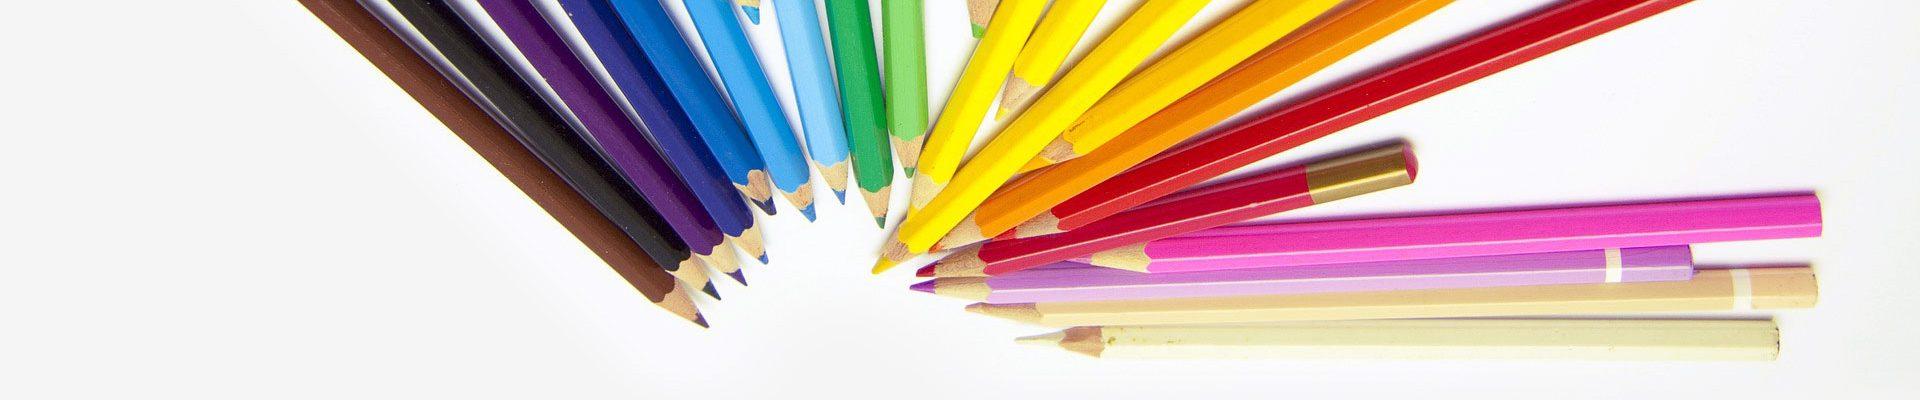 crayons-1018580_1920a